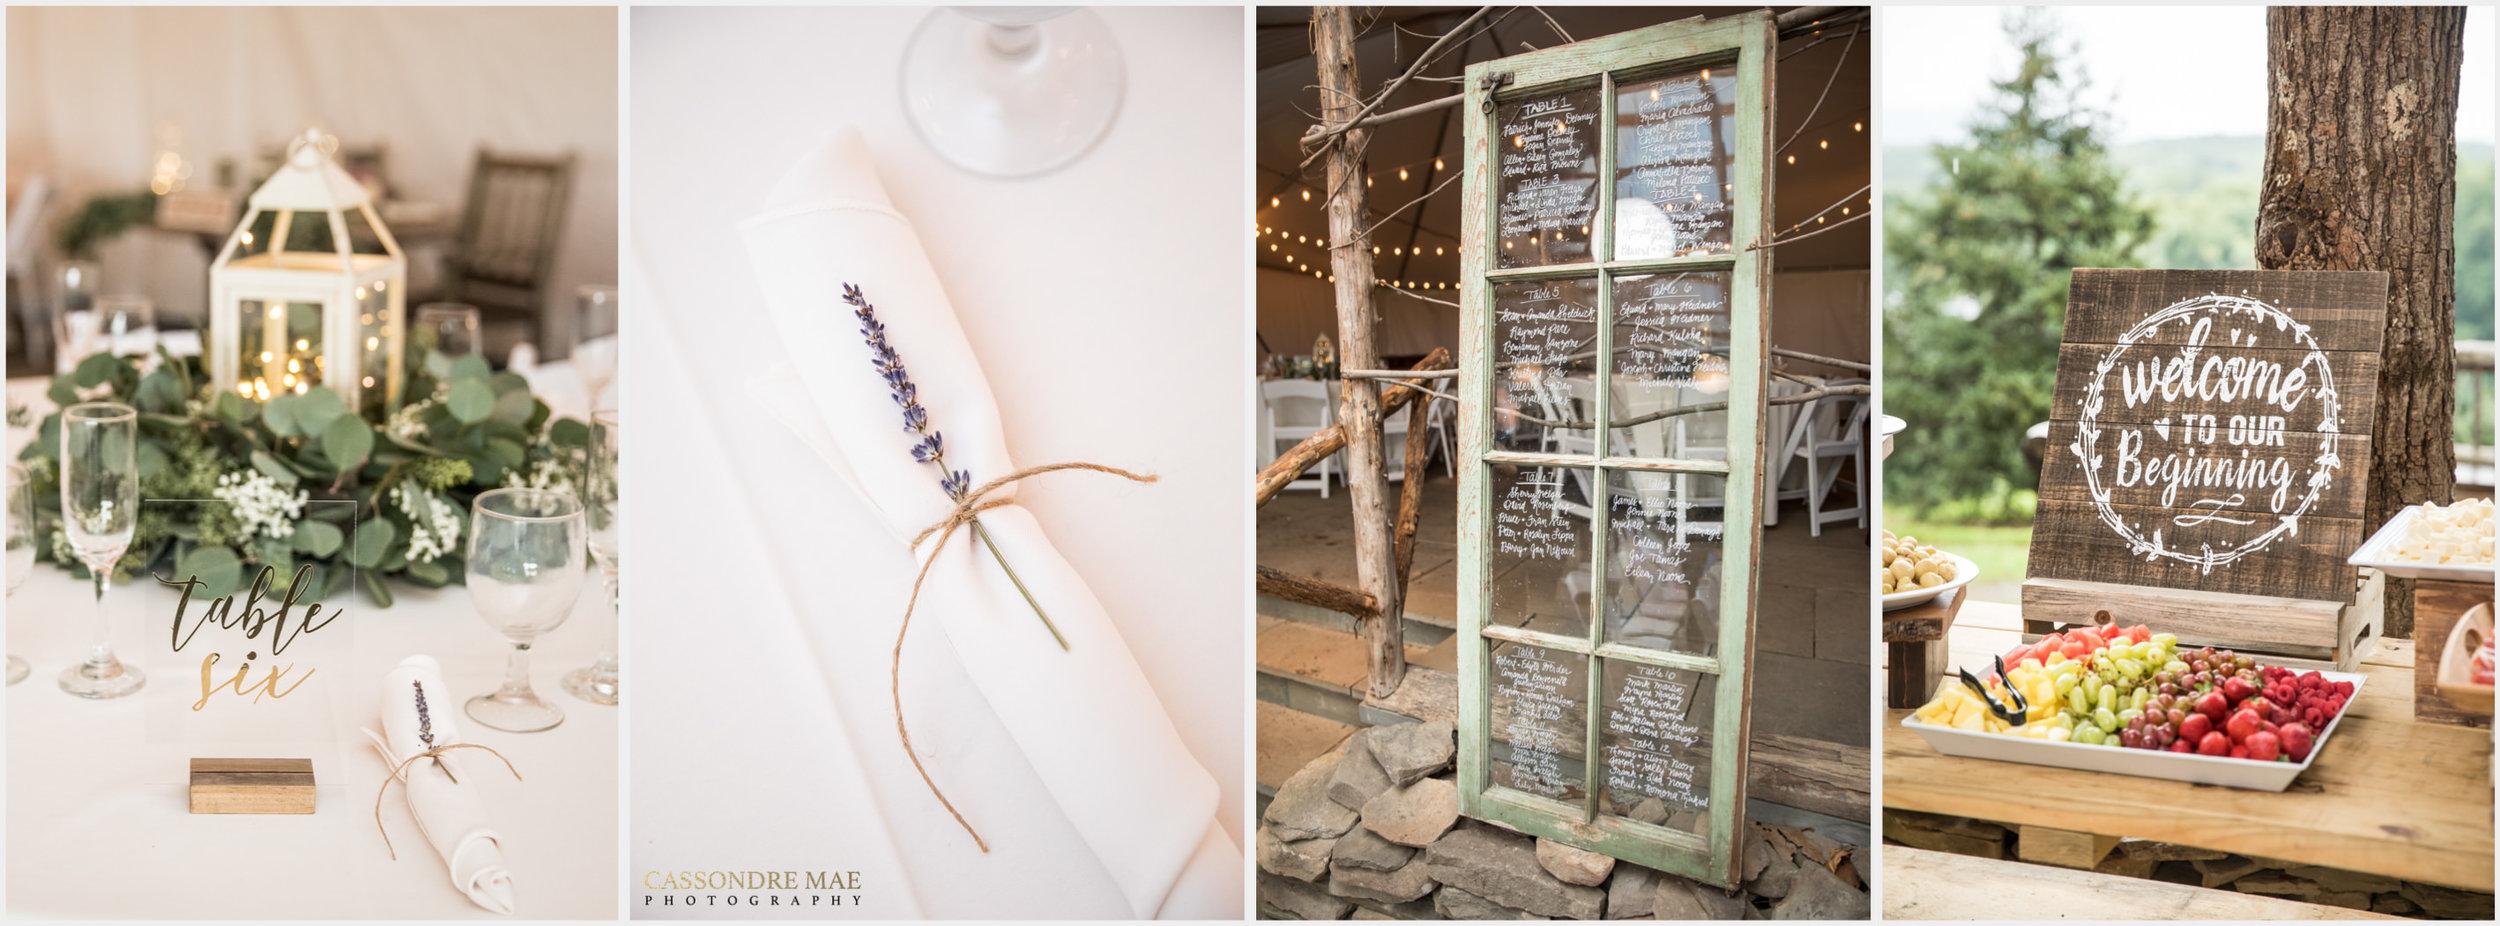 Cassondre Mae Photography Emmerich Tree Farm Wedding 3.jpg